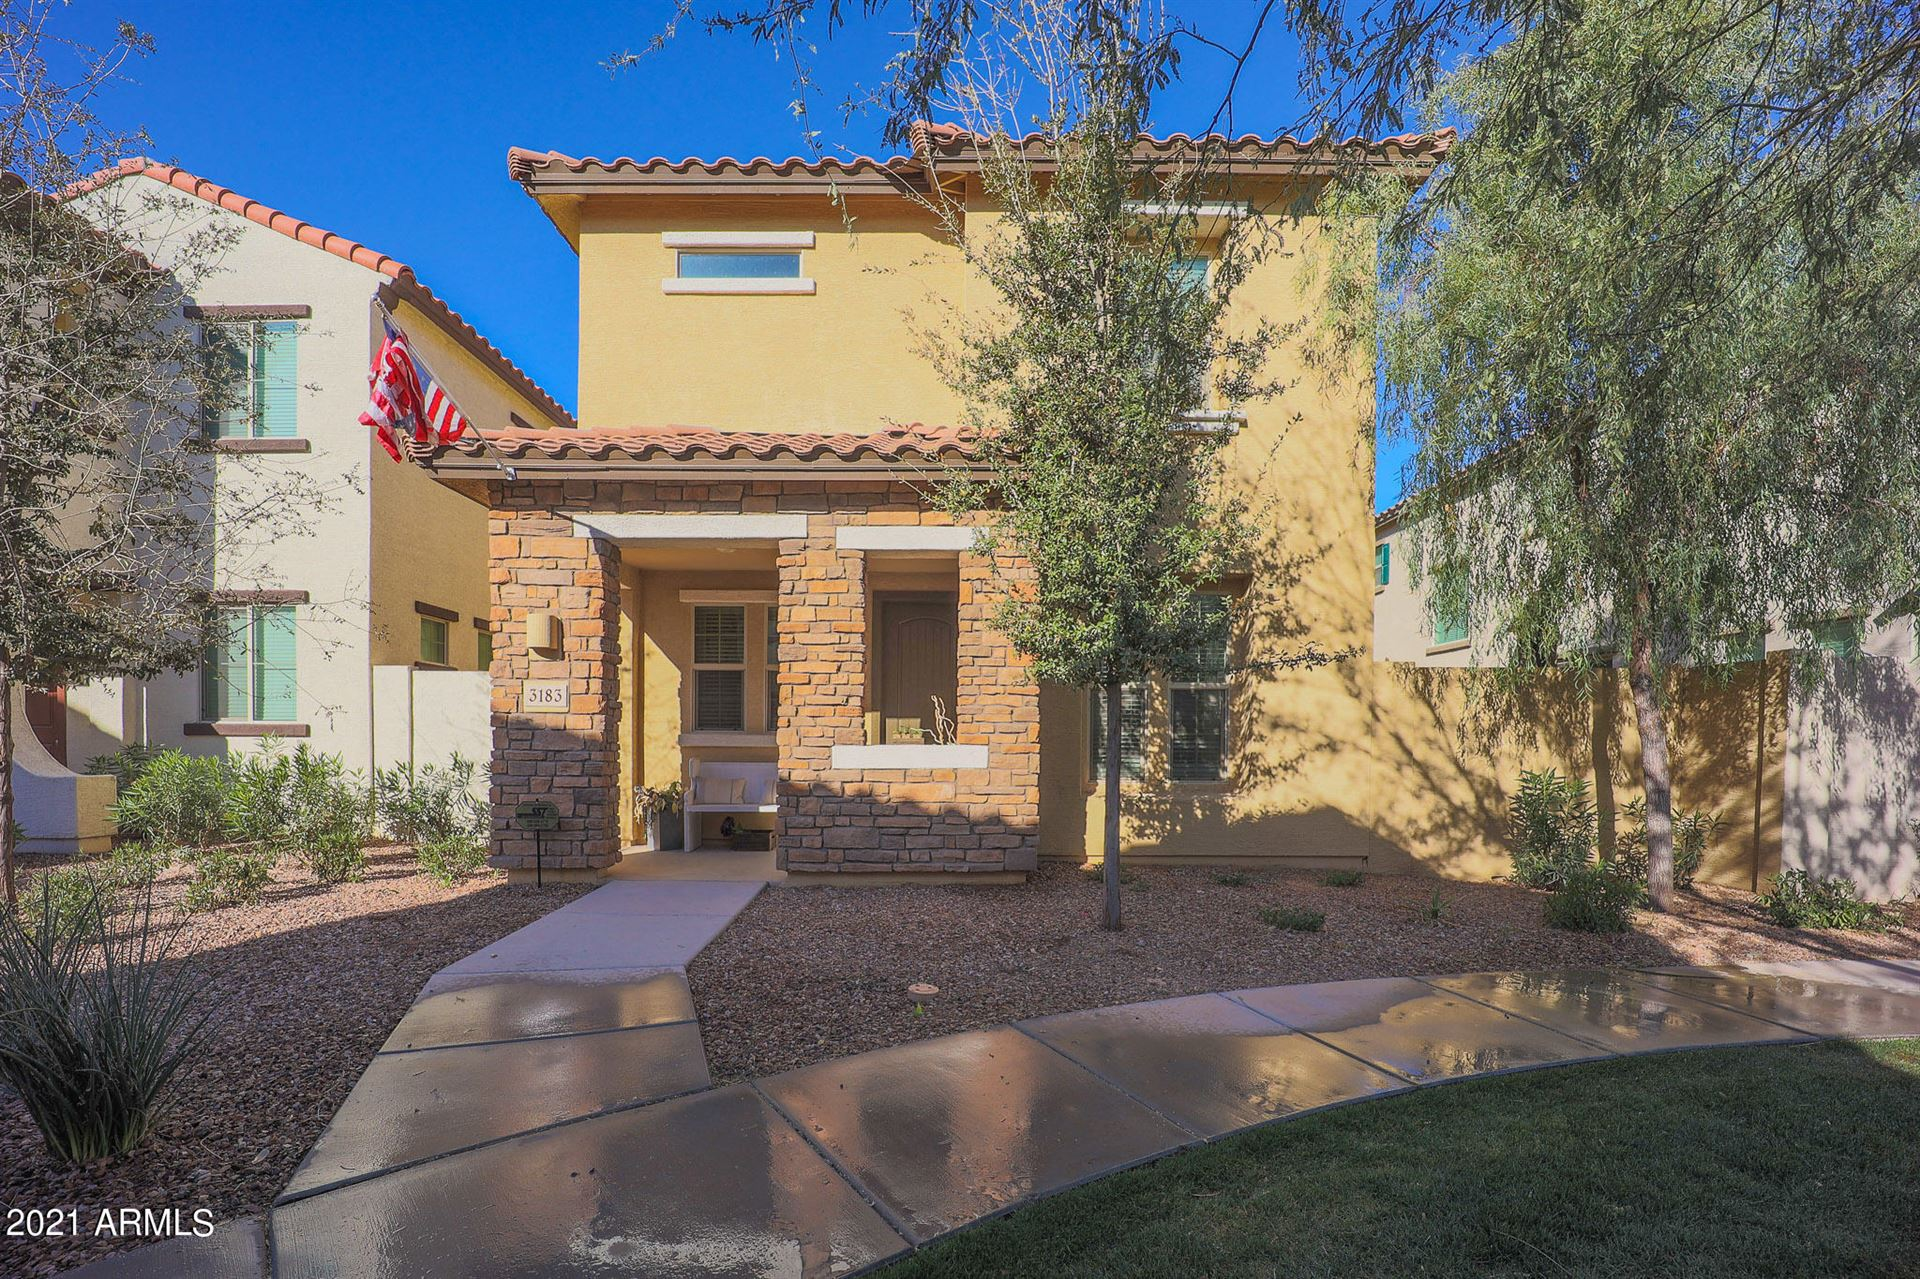 3183 S MAGNOLIA Lane, Chandler, AZ 85286 - MLS#: 6202051